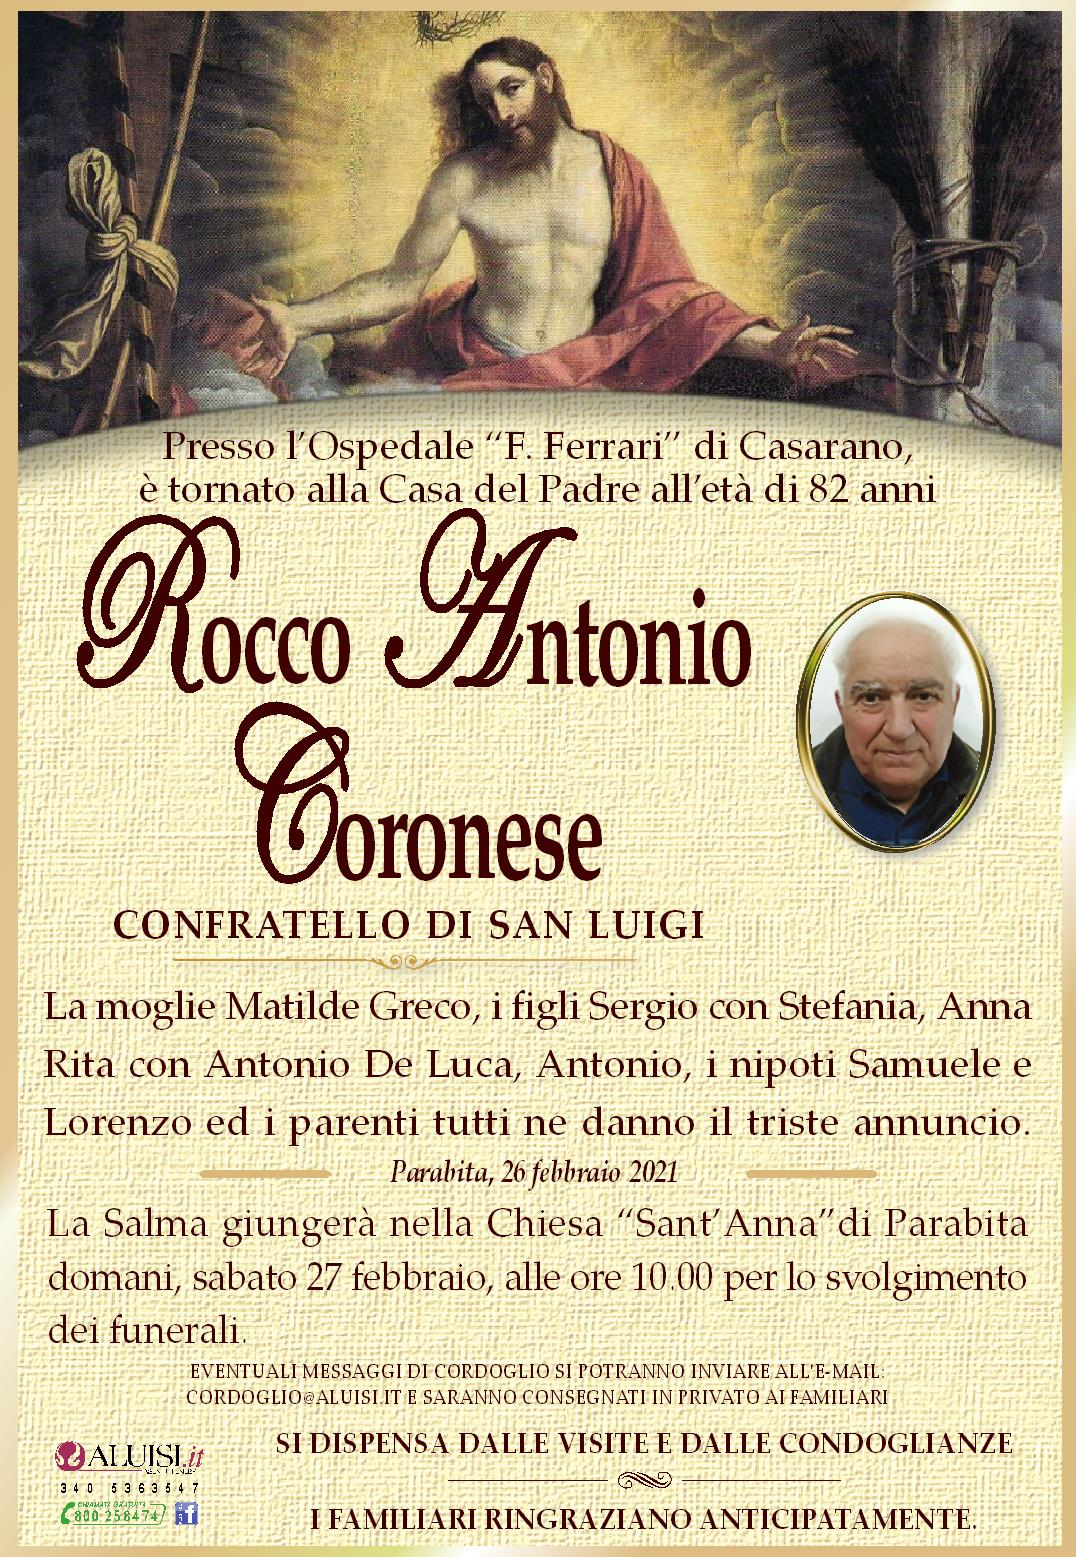 Annuncio-ROCCO-ANTONIO-CORONESE-PARABITApiccolo-1.jpg